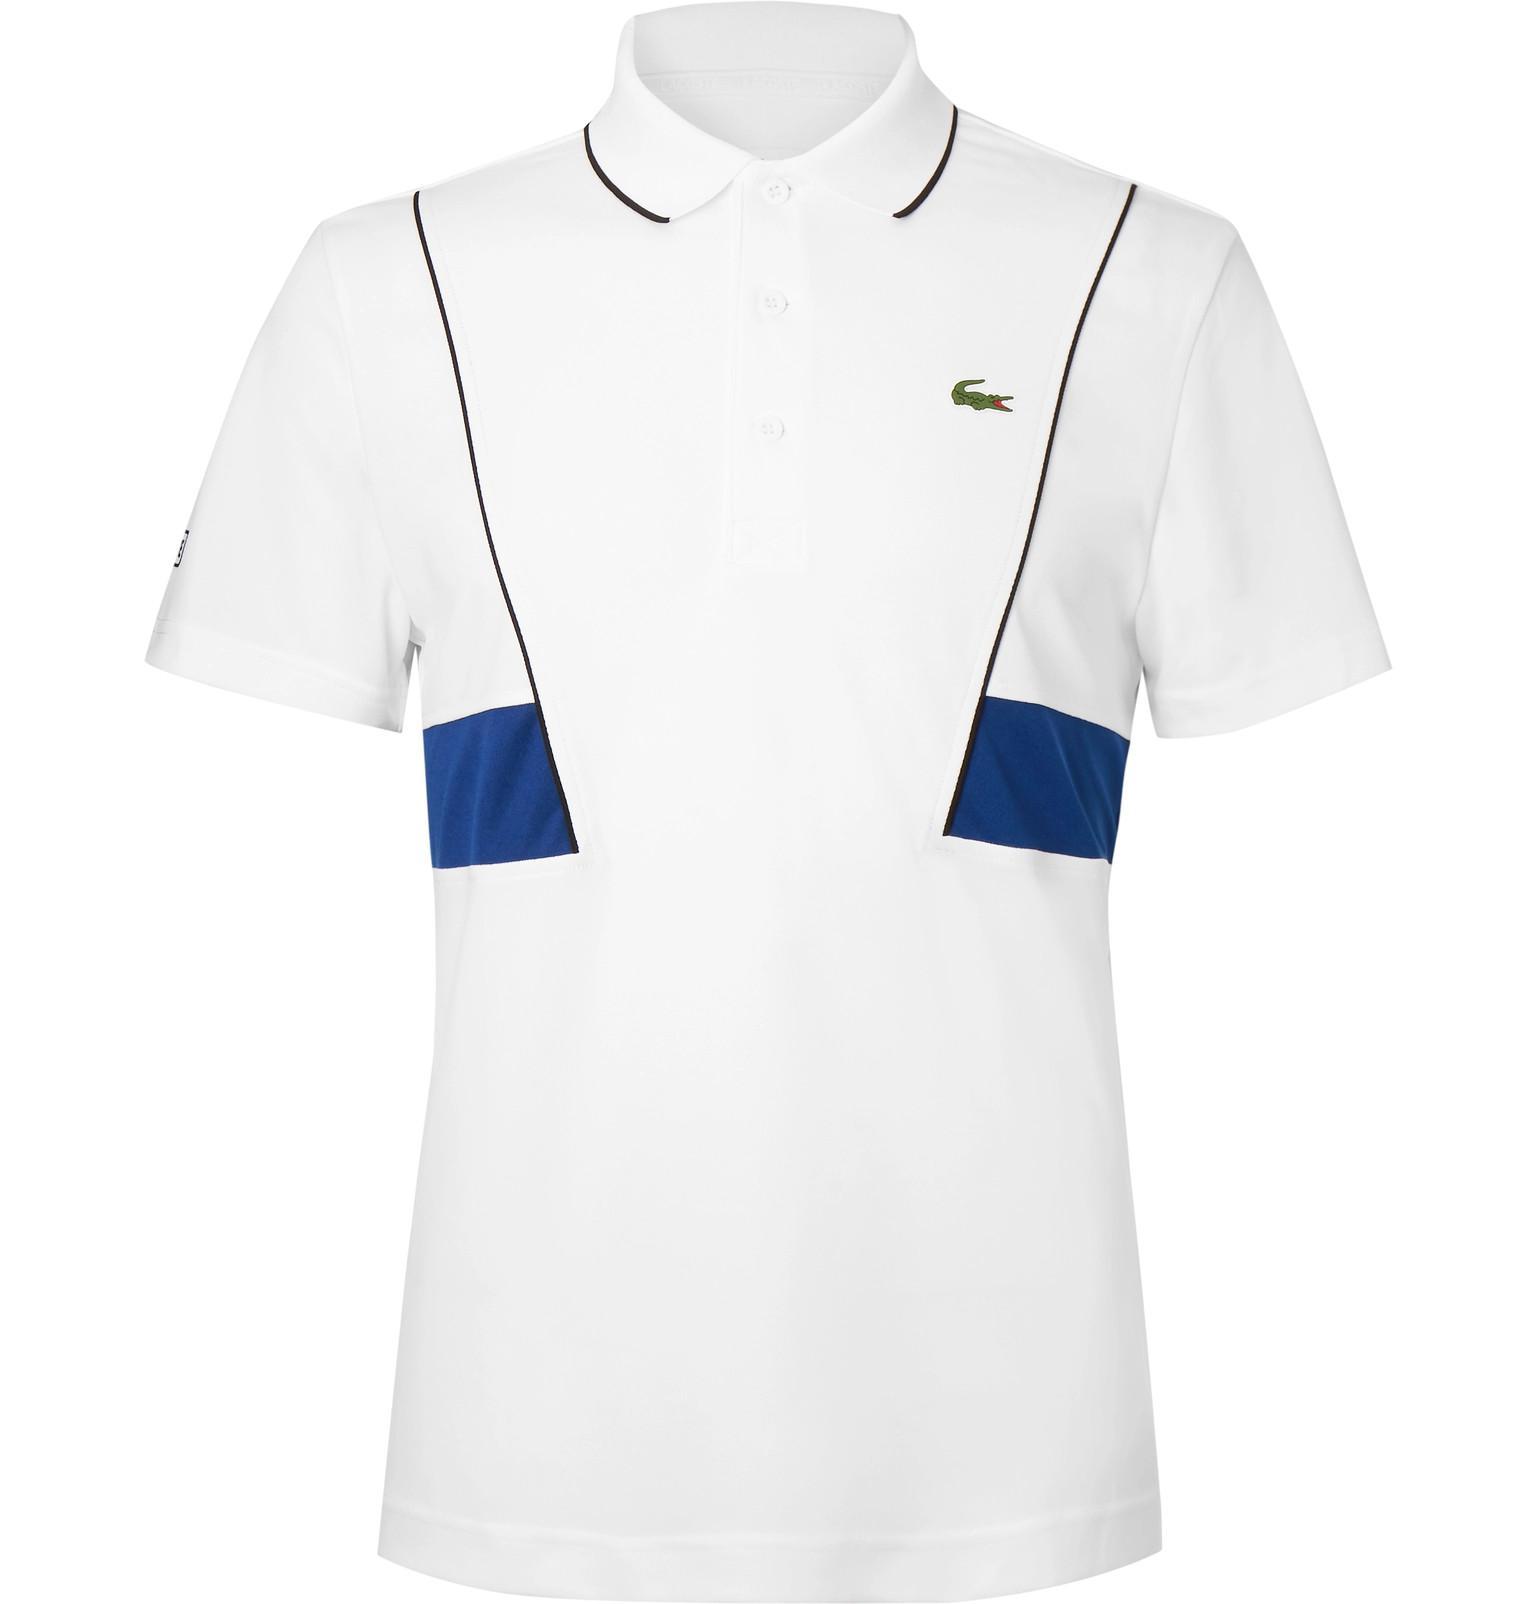 a0cd0a6fdf Sport White Polo Lacoste Tennis In Lyst Shirt Piqué Djokovic Novak ABz5ggqw